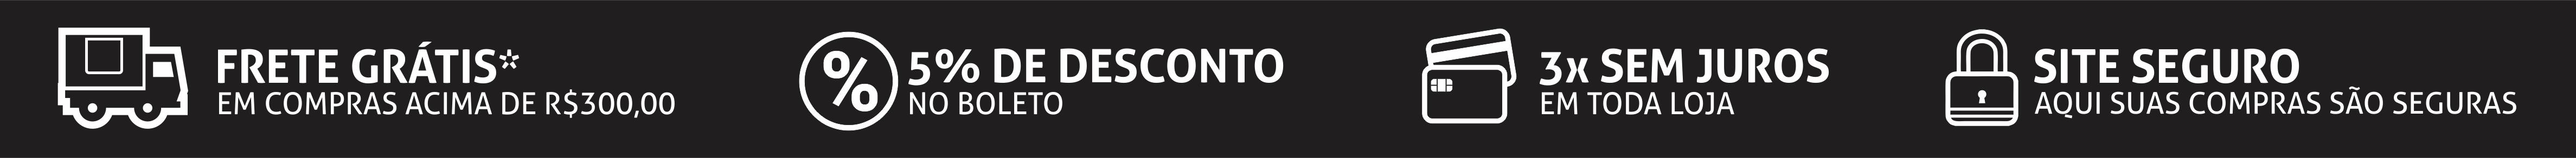 Banner Tarja Black Friday 2016